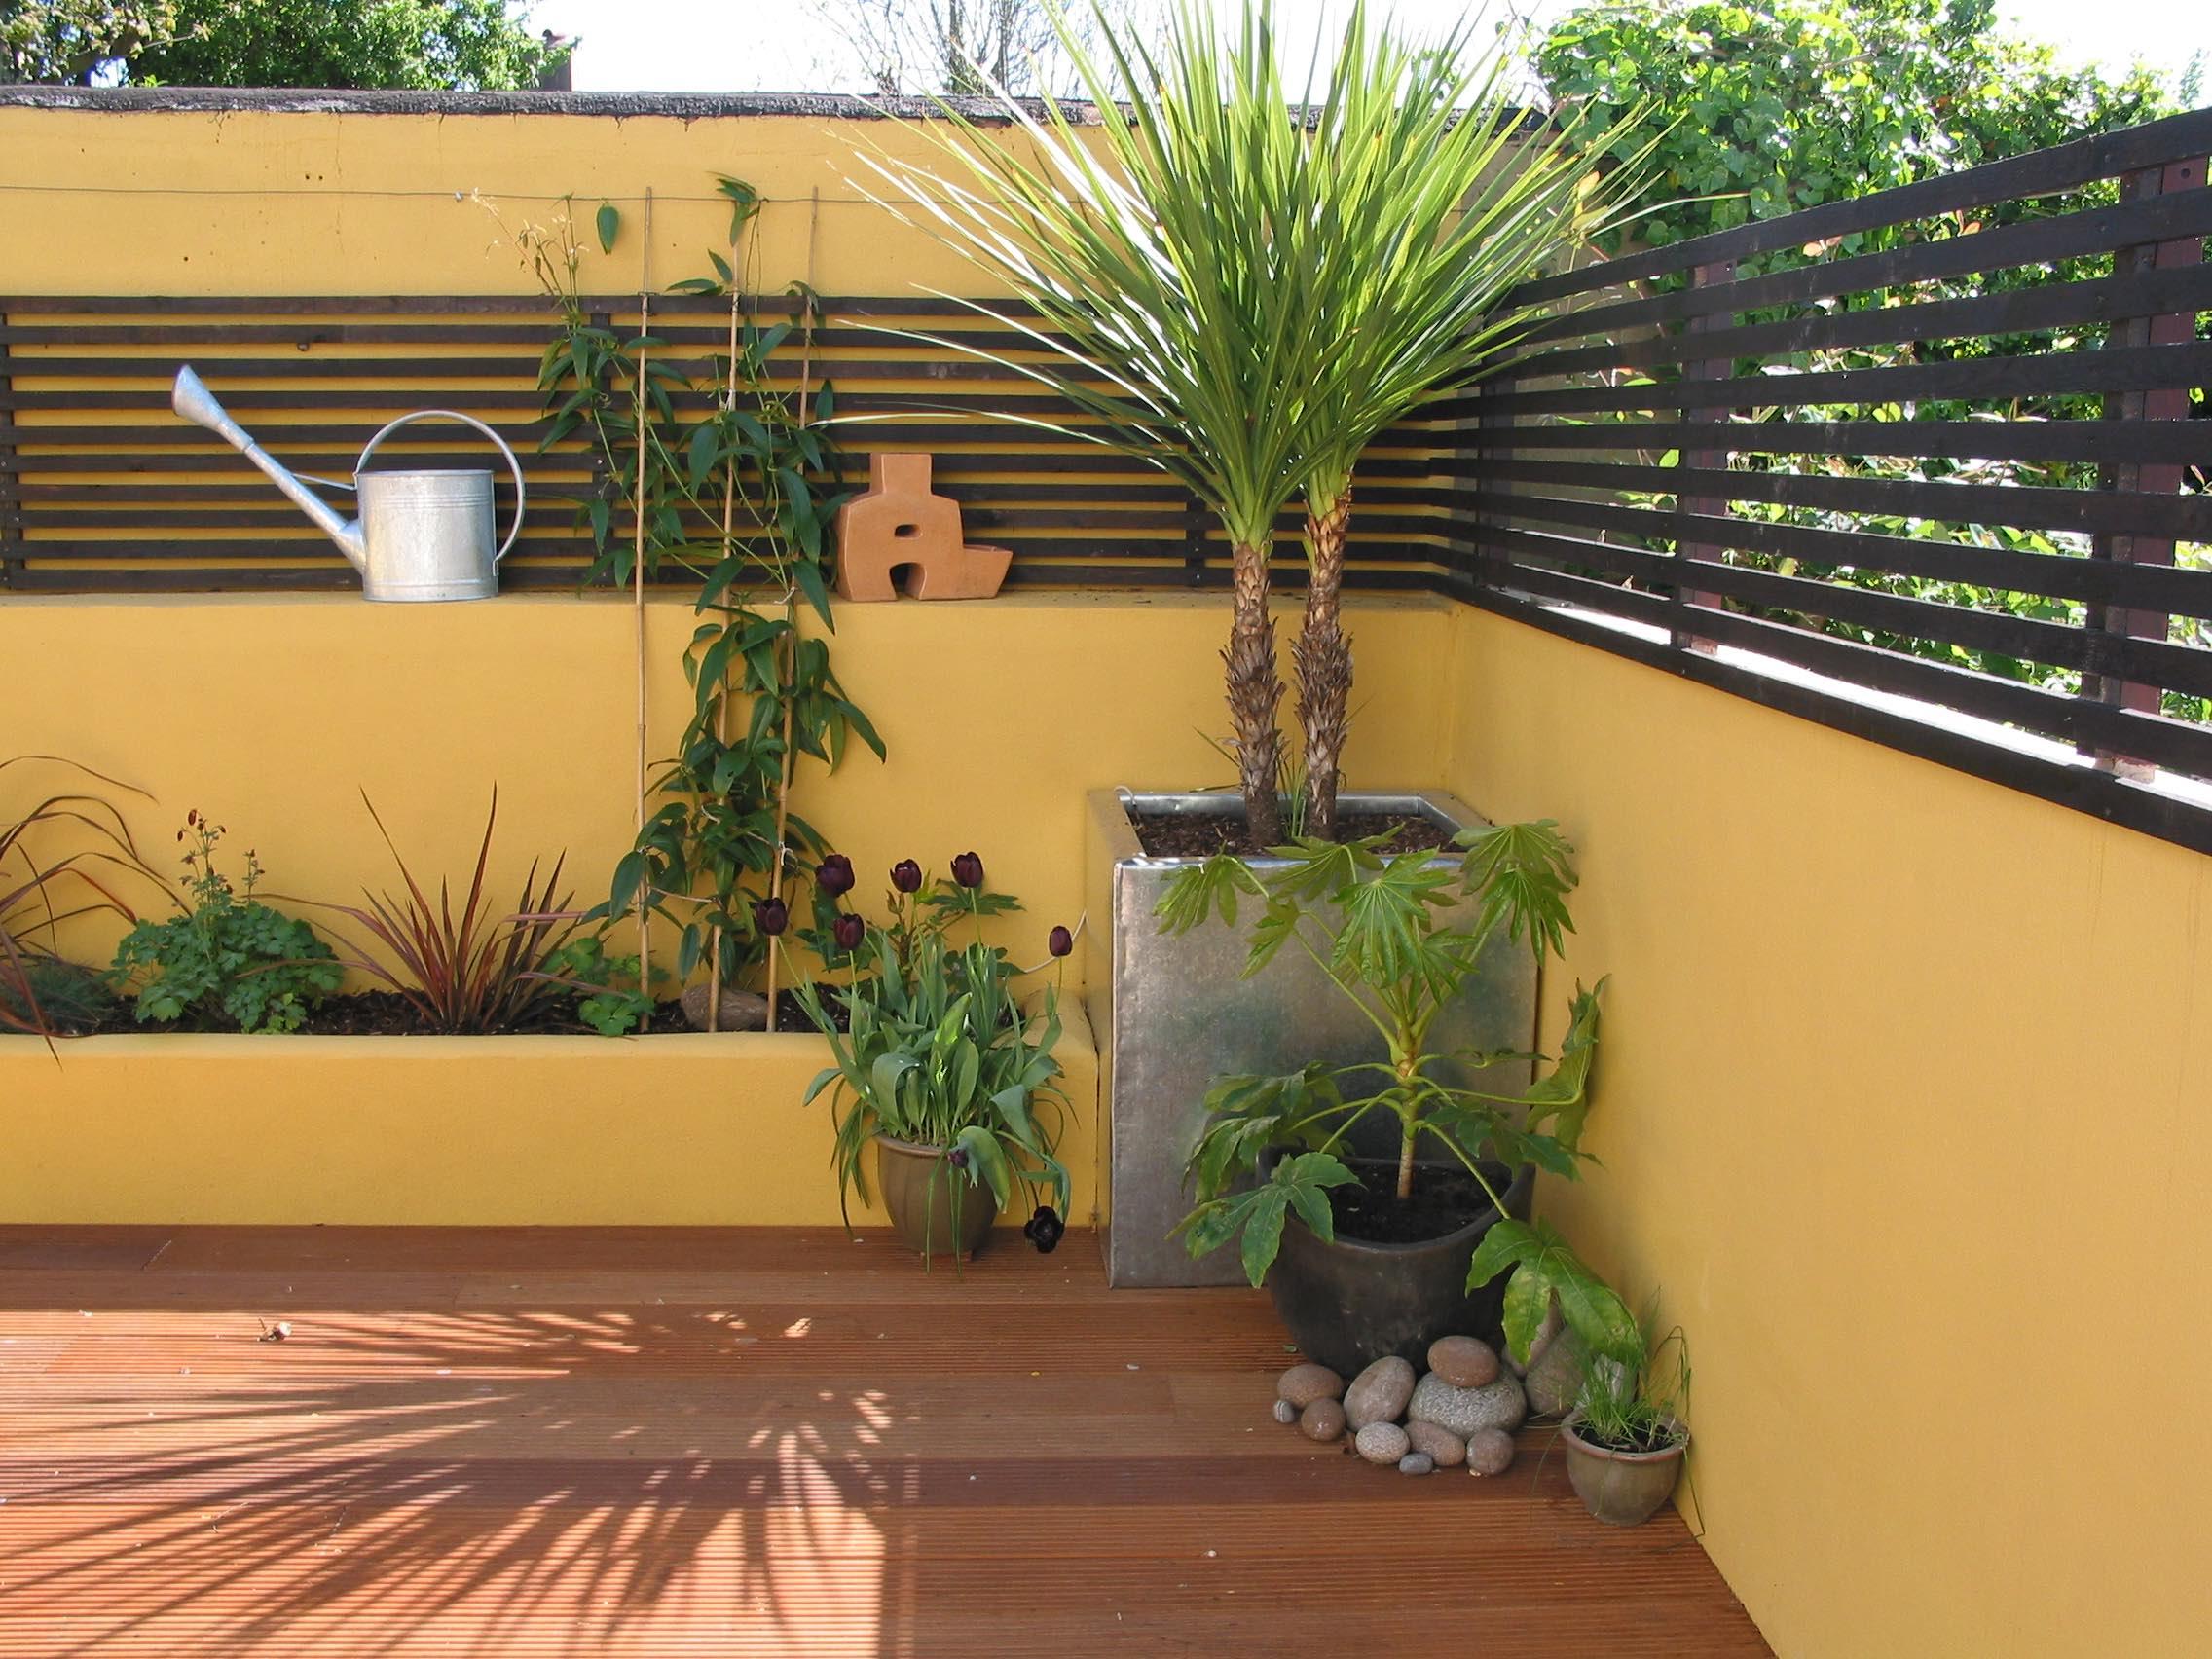 Brighton Zinc planter